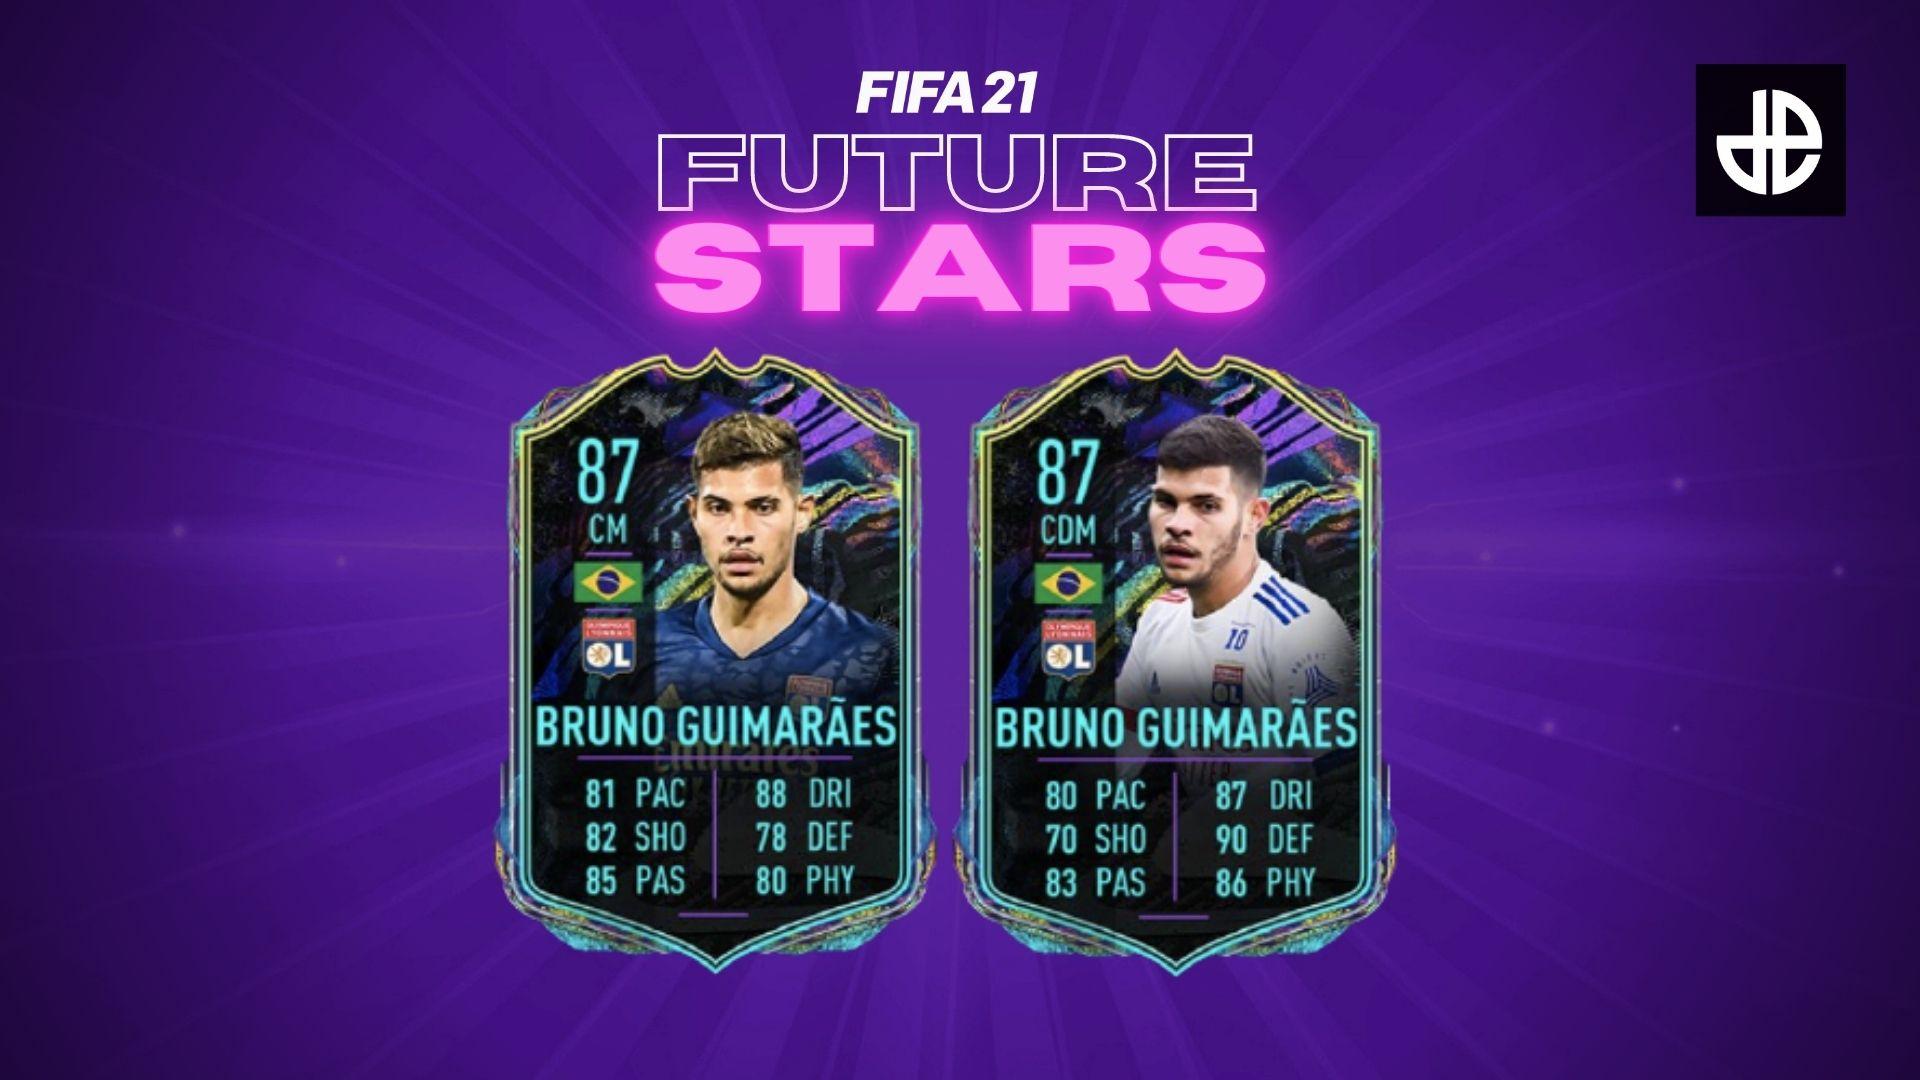 FIFA 21 Future stars sbc